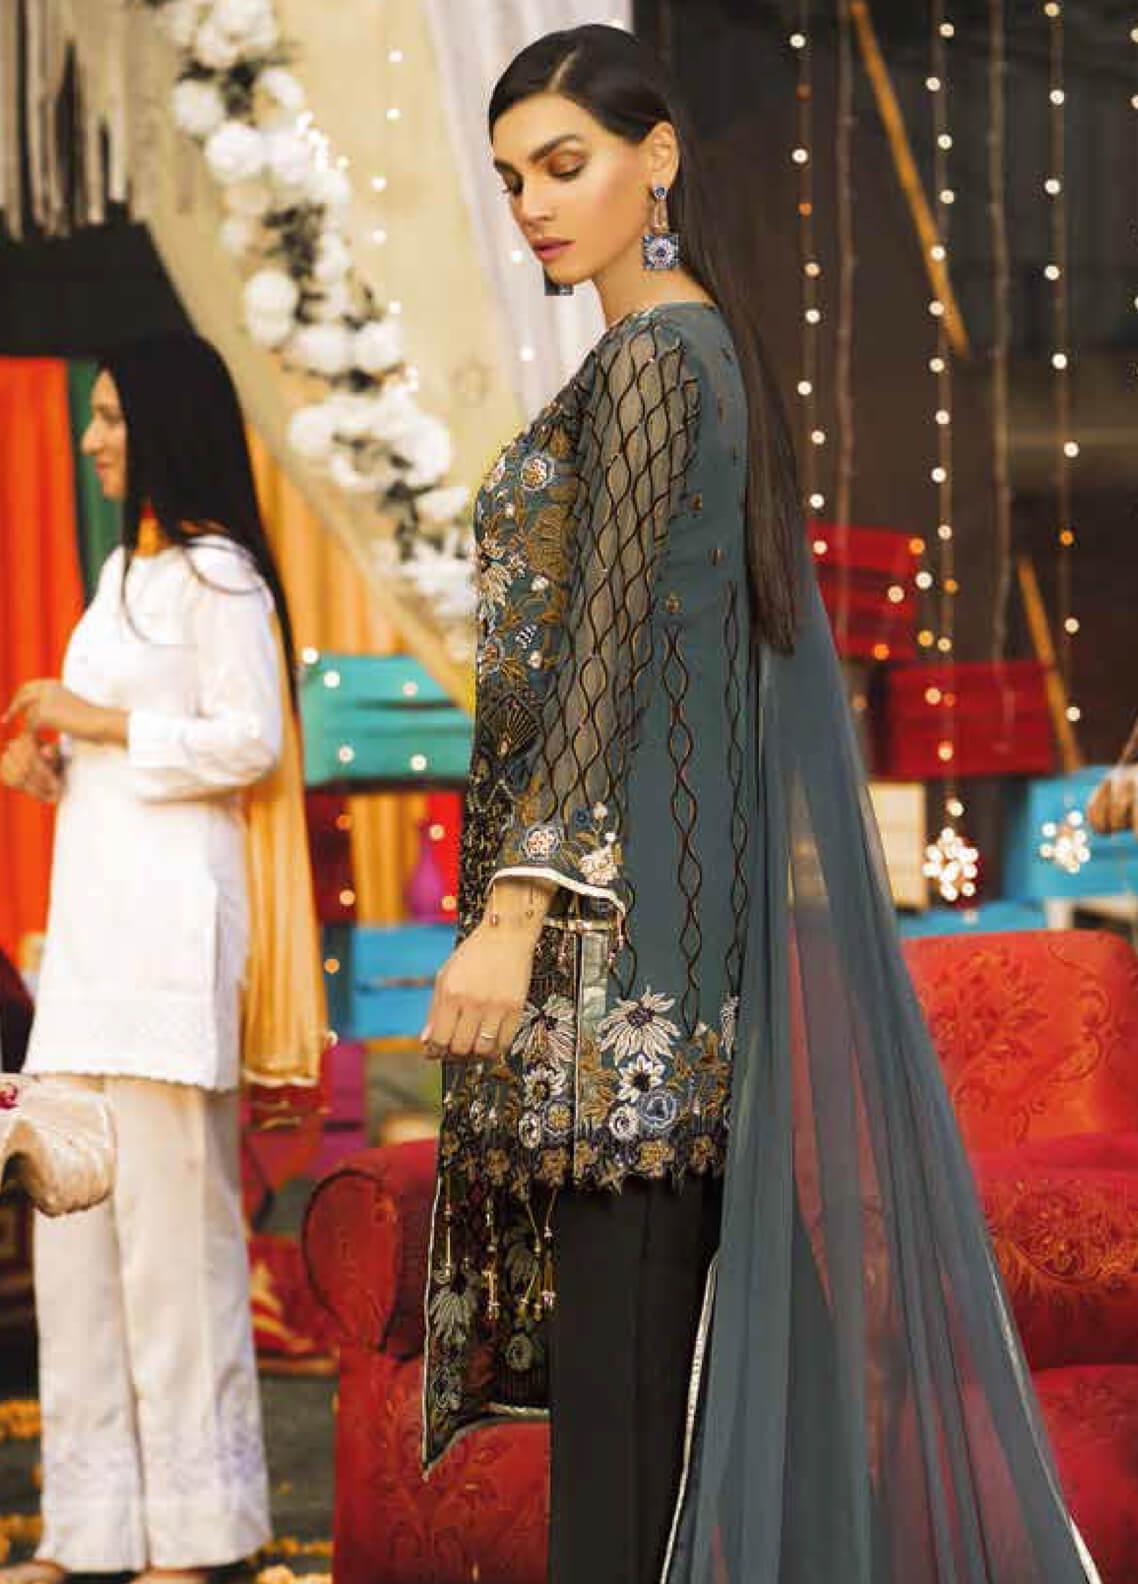 049164ab31 Emaan Adeel Online: Emaan Adeel Luxury Chiffon Collection 2019 ...